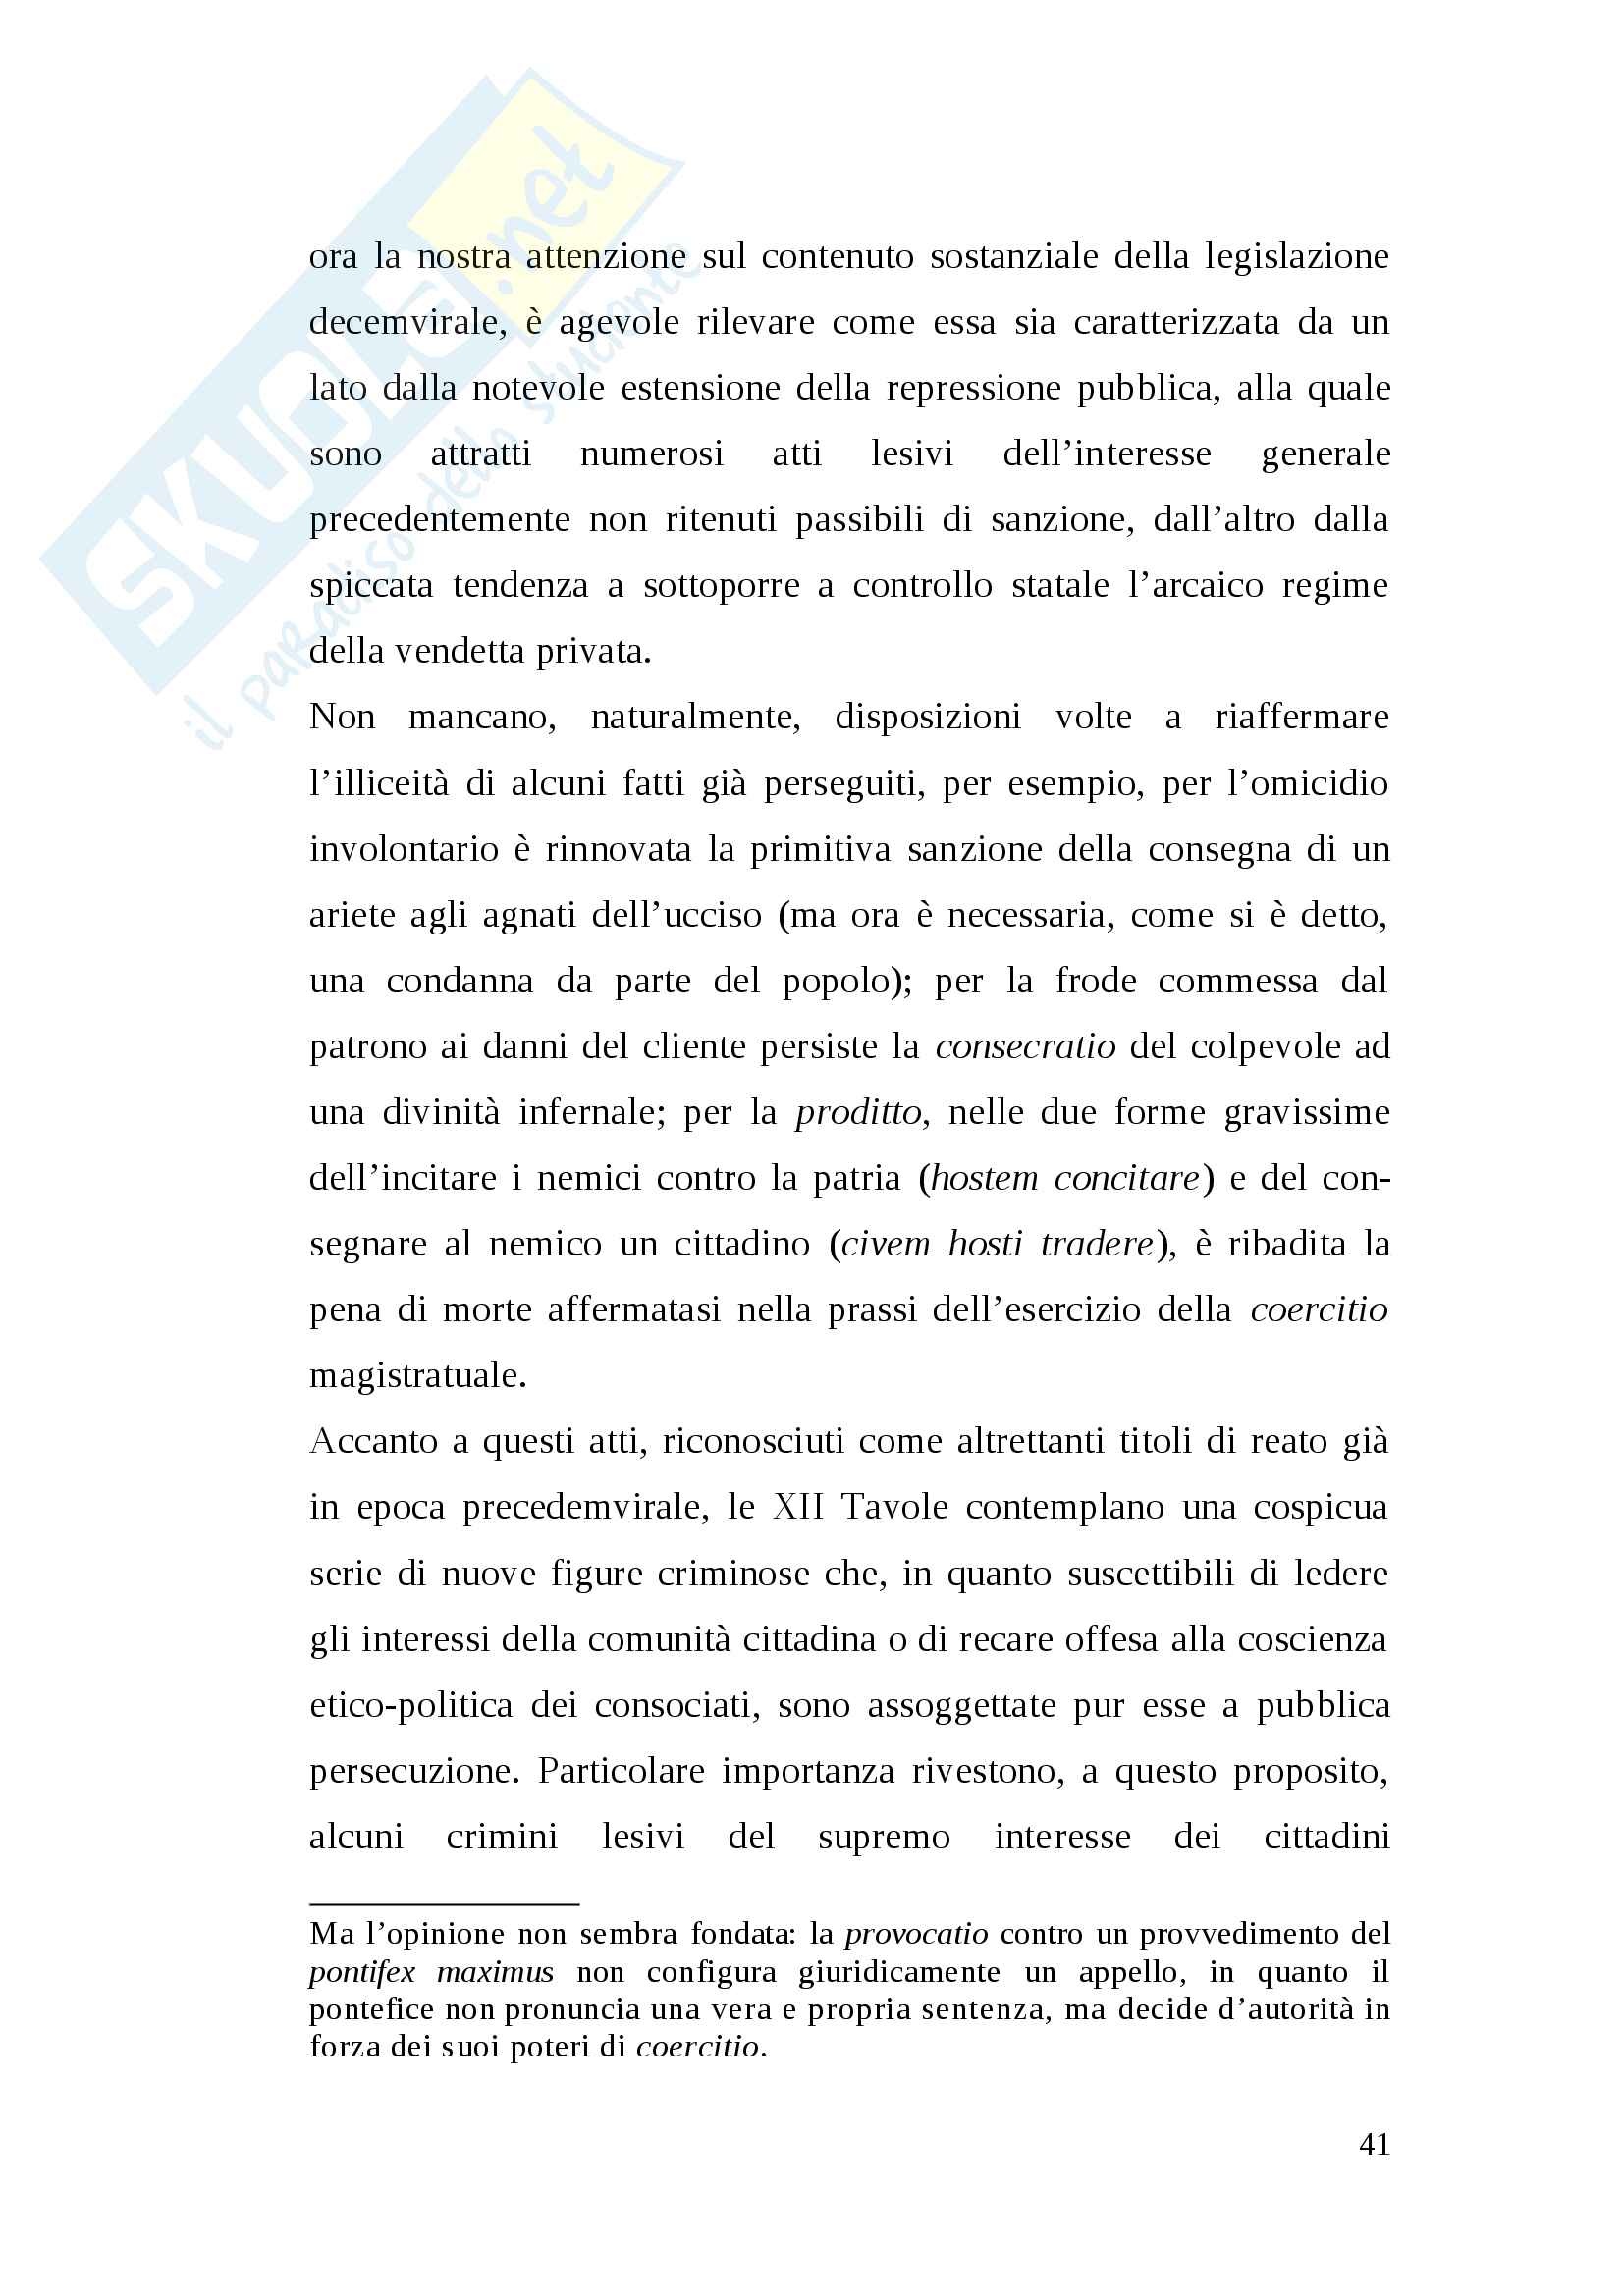 Tesi pena di morte antica Roma Pag. 41